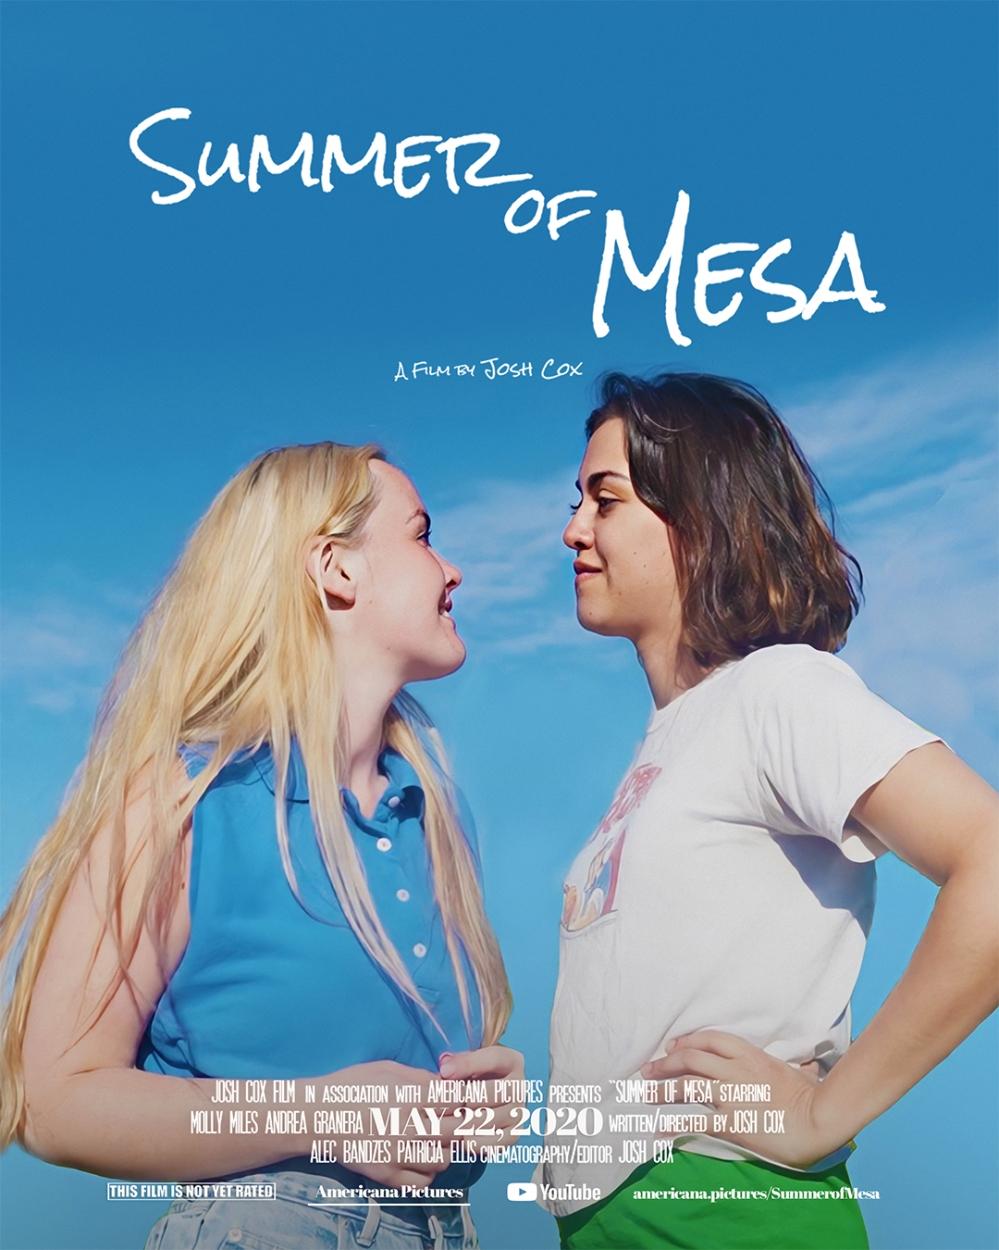 Summer of Mesa 2020